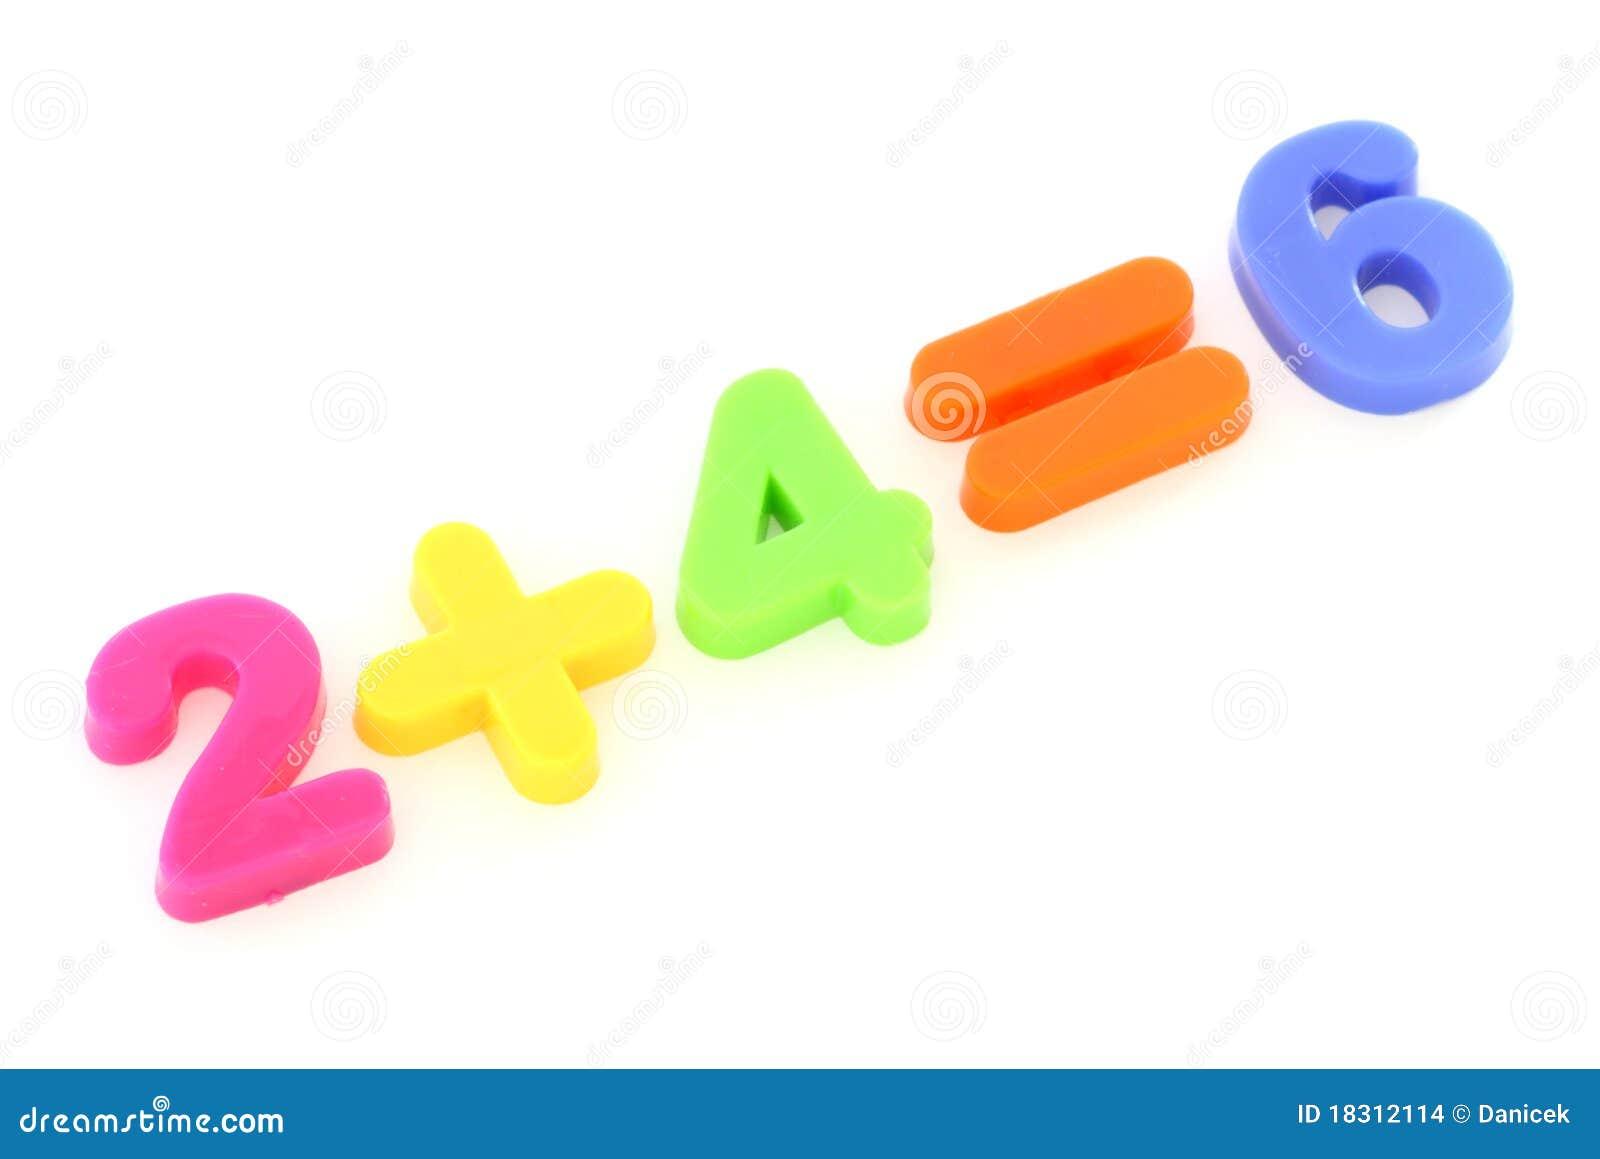 Números dos dígitos coloridos do brinquedo